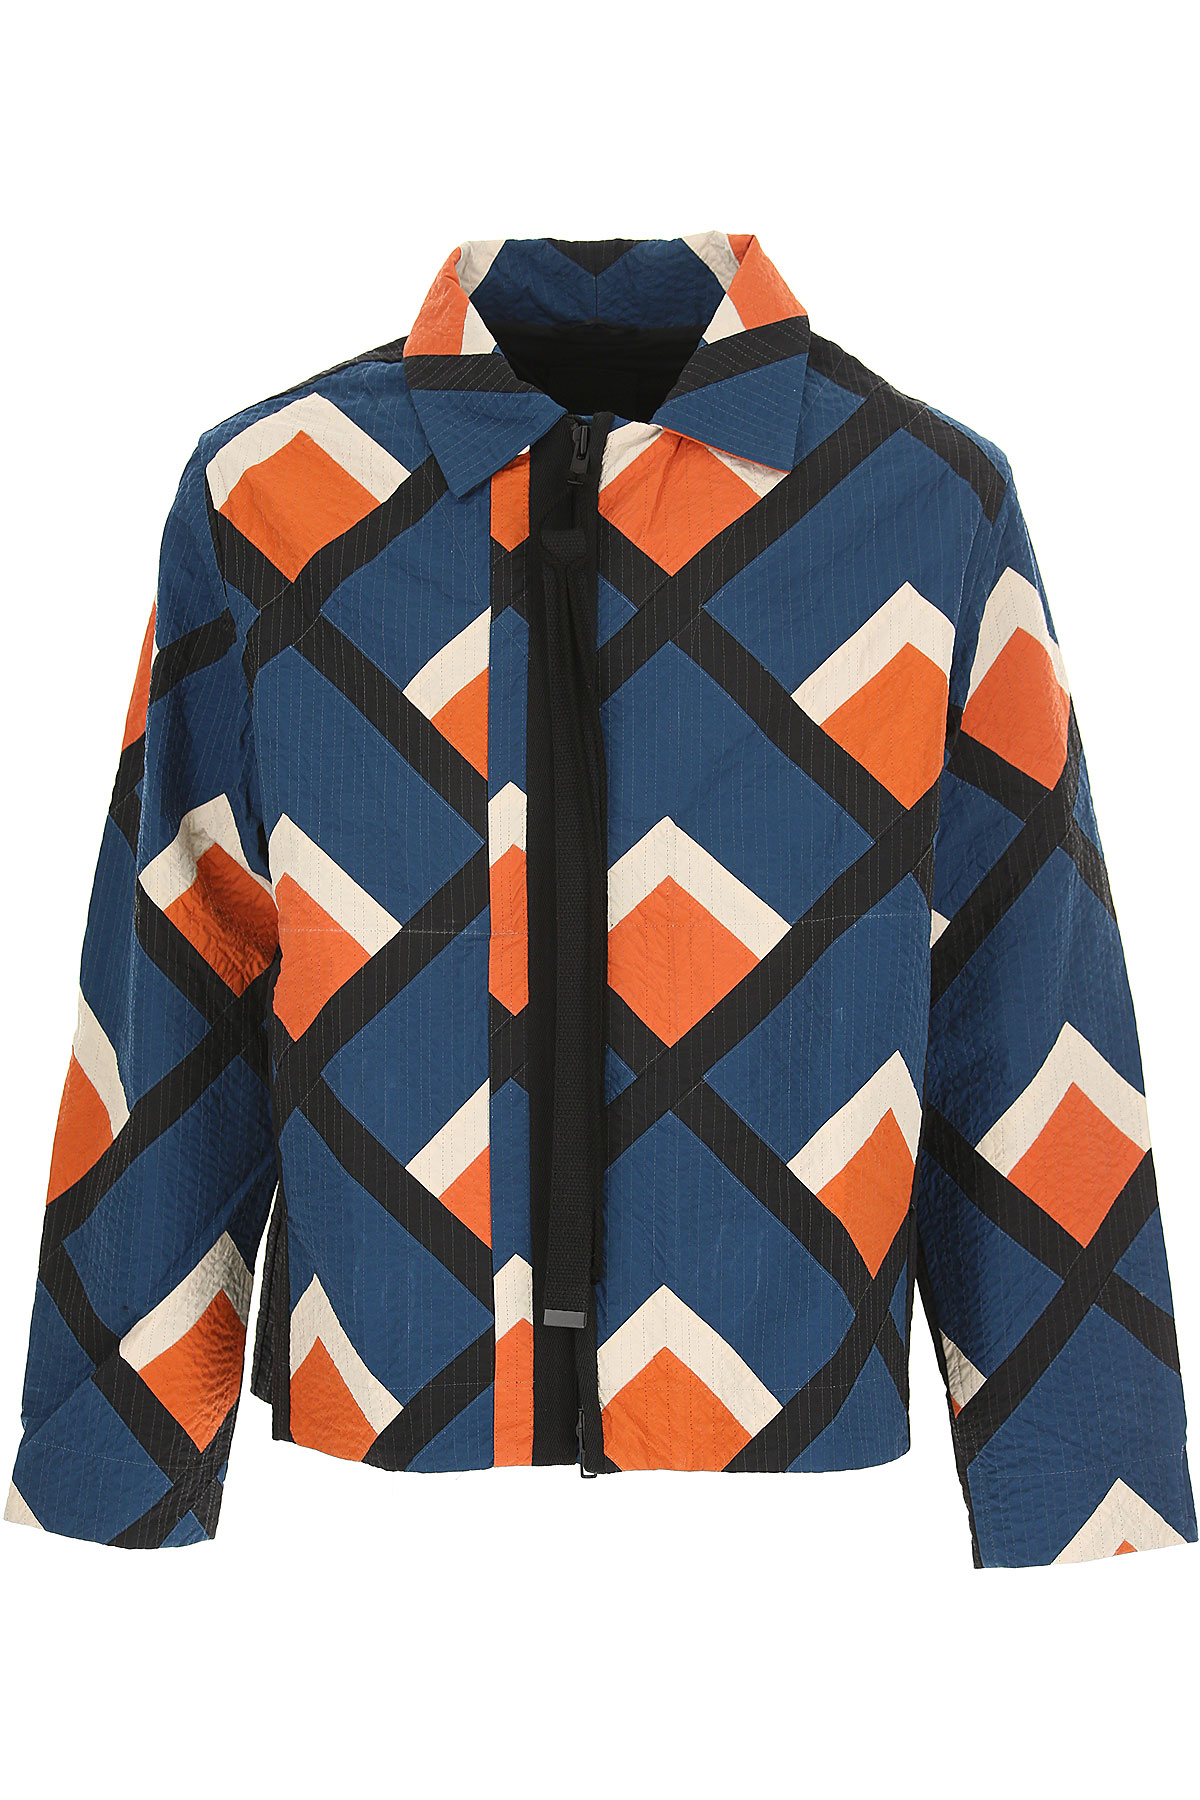 Craig Green Jacket for Men On Sale in Outlet, Petroleum Blue, Cotton, 2019, M S